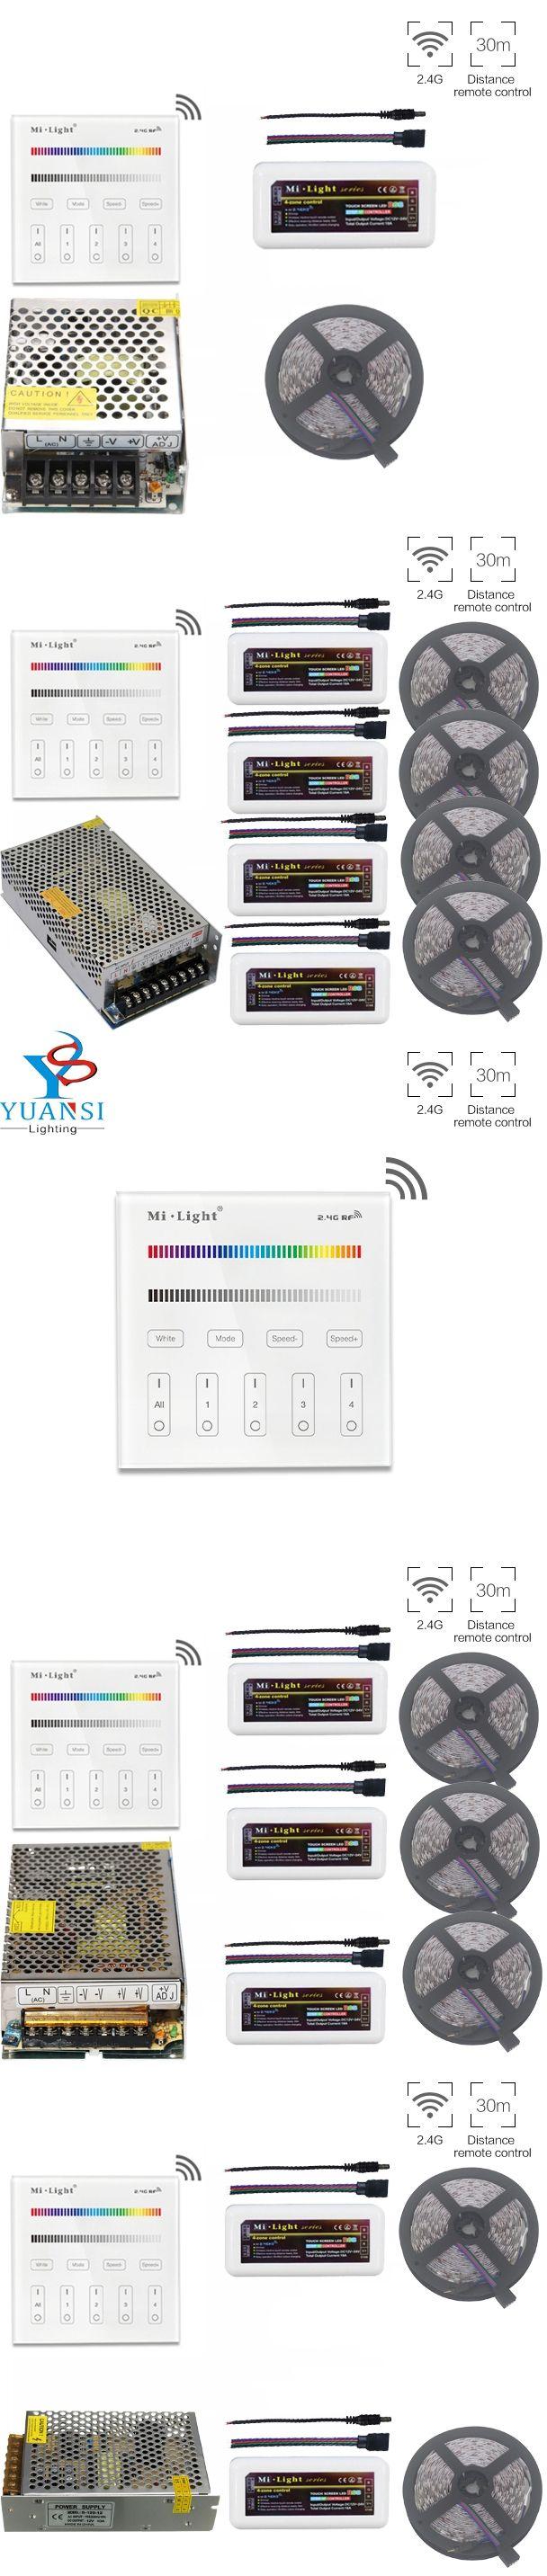 5~20m 5050 RGB Led Strip Light+Mi.Light RGB Led Controller+2.4G B3 Wall Mount Led Touch Panel Remote+12V Led Transformer